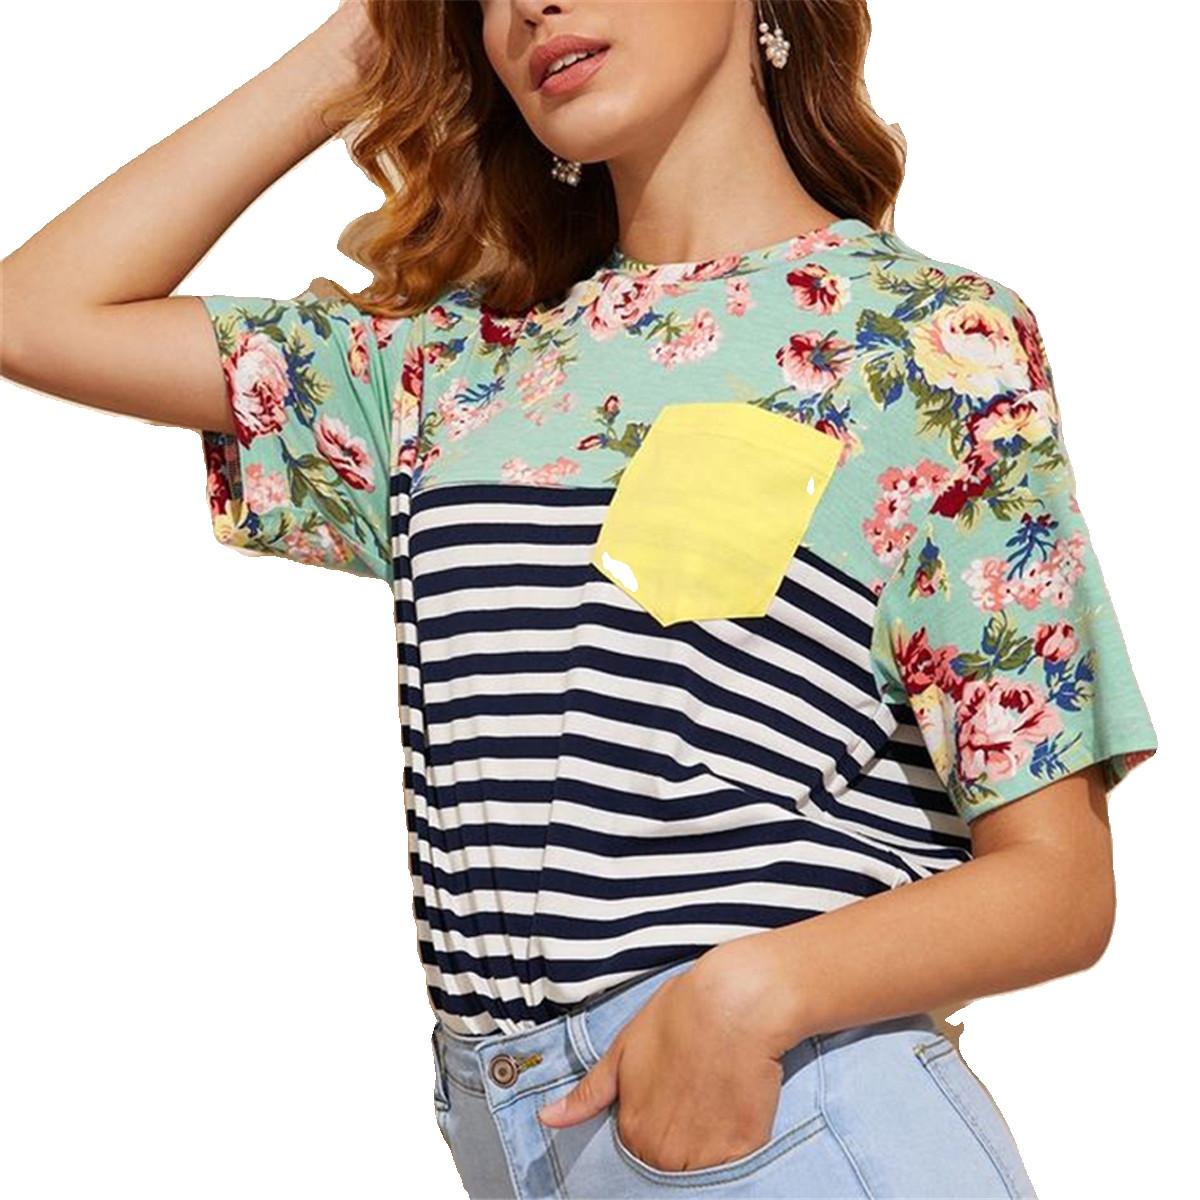 Womens Maternity Pregnant Long Sleeve T-shirt Cardigan Nursing Breastfeeding Top